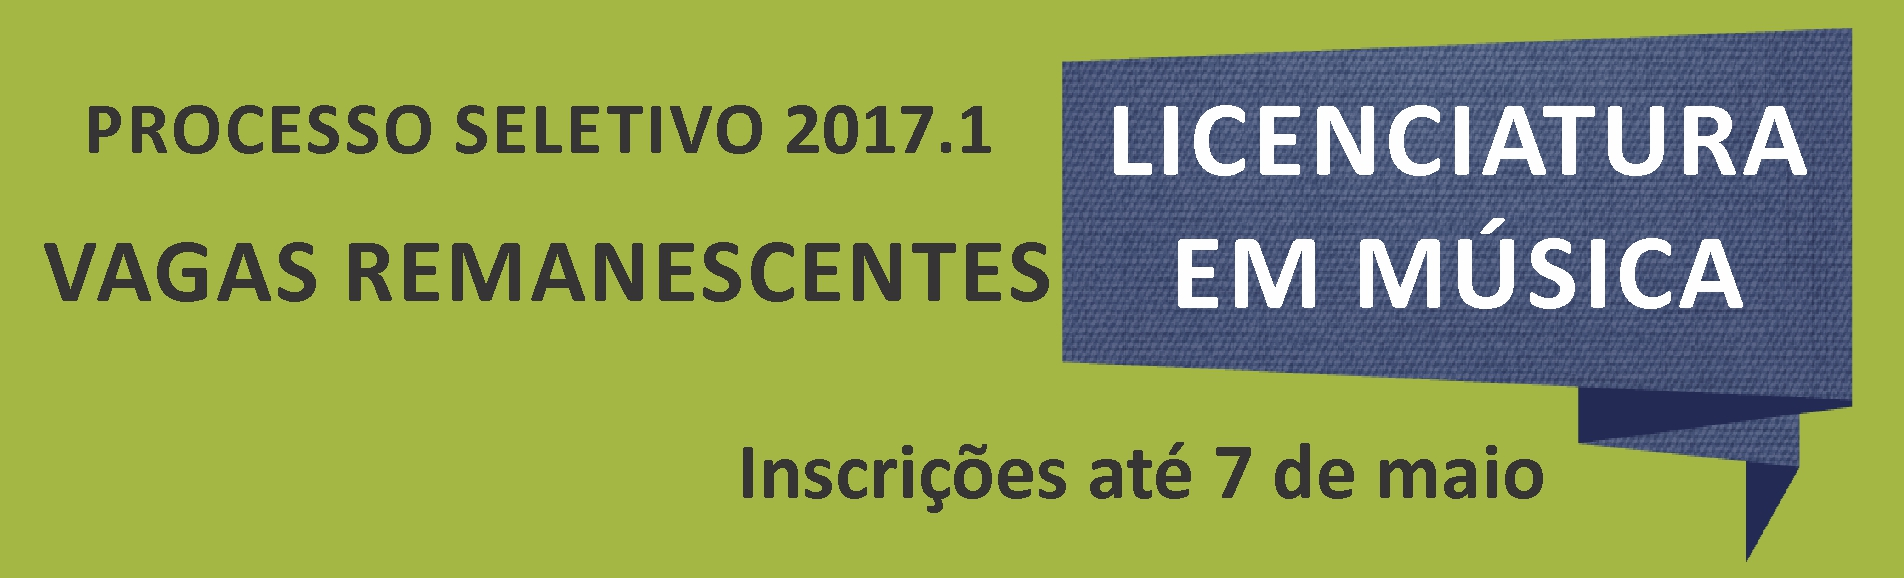 Banner_VagasRemanescentes_LicMusica